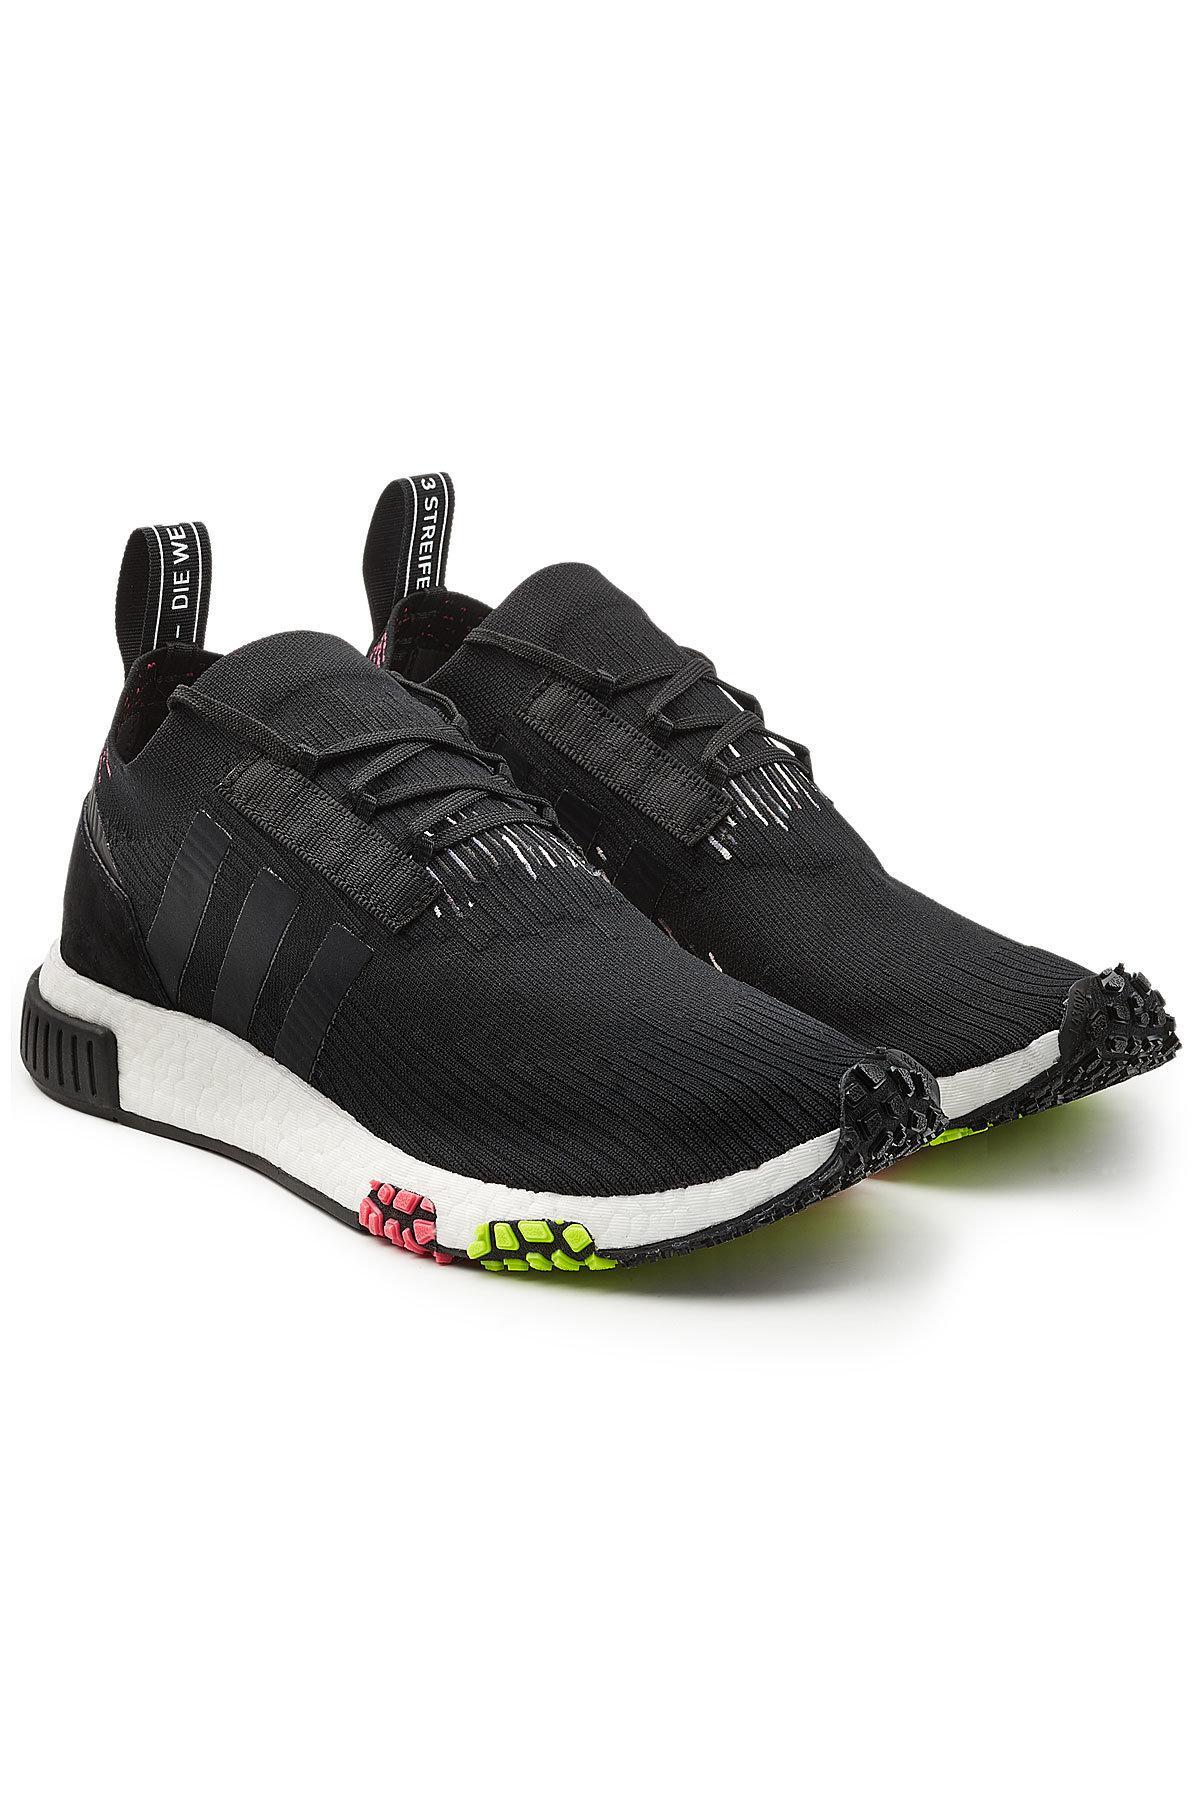 adidas Originals Nmd Racer Primeknit Sneakers in Black for